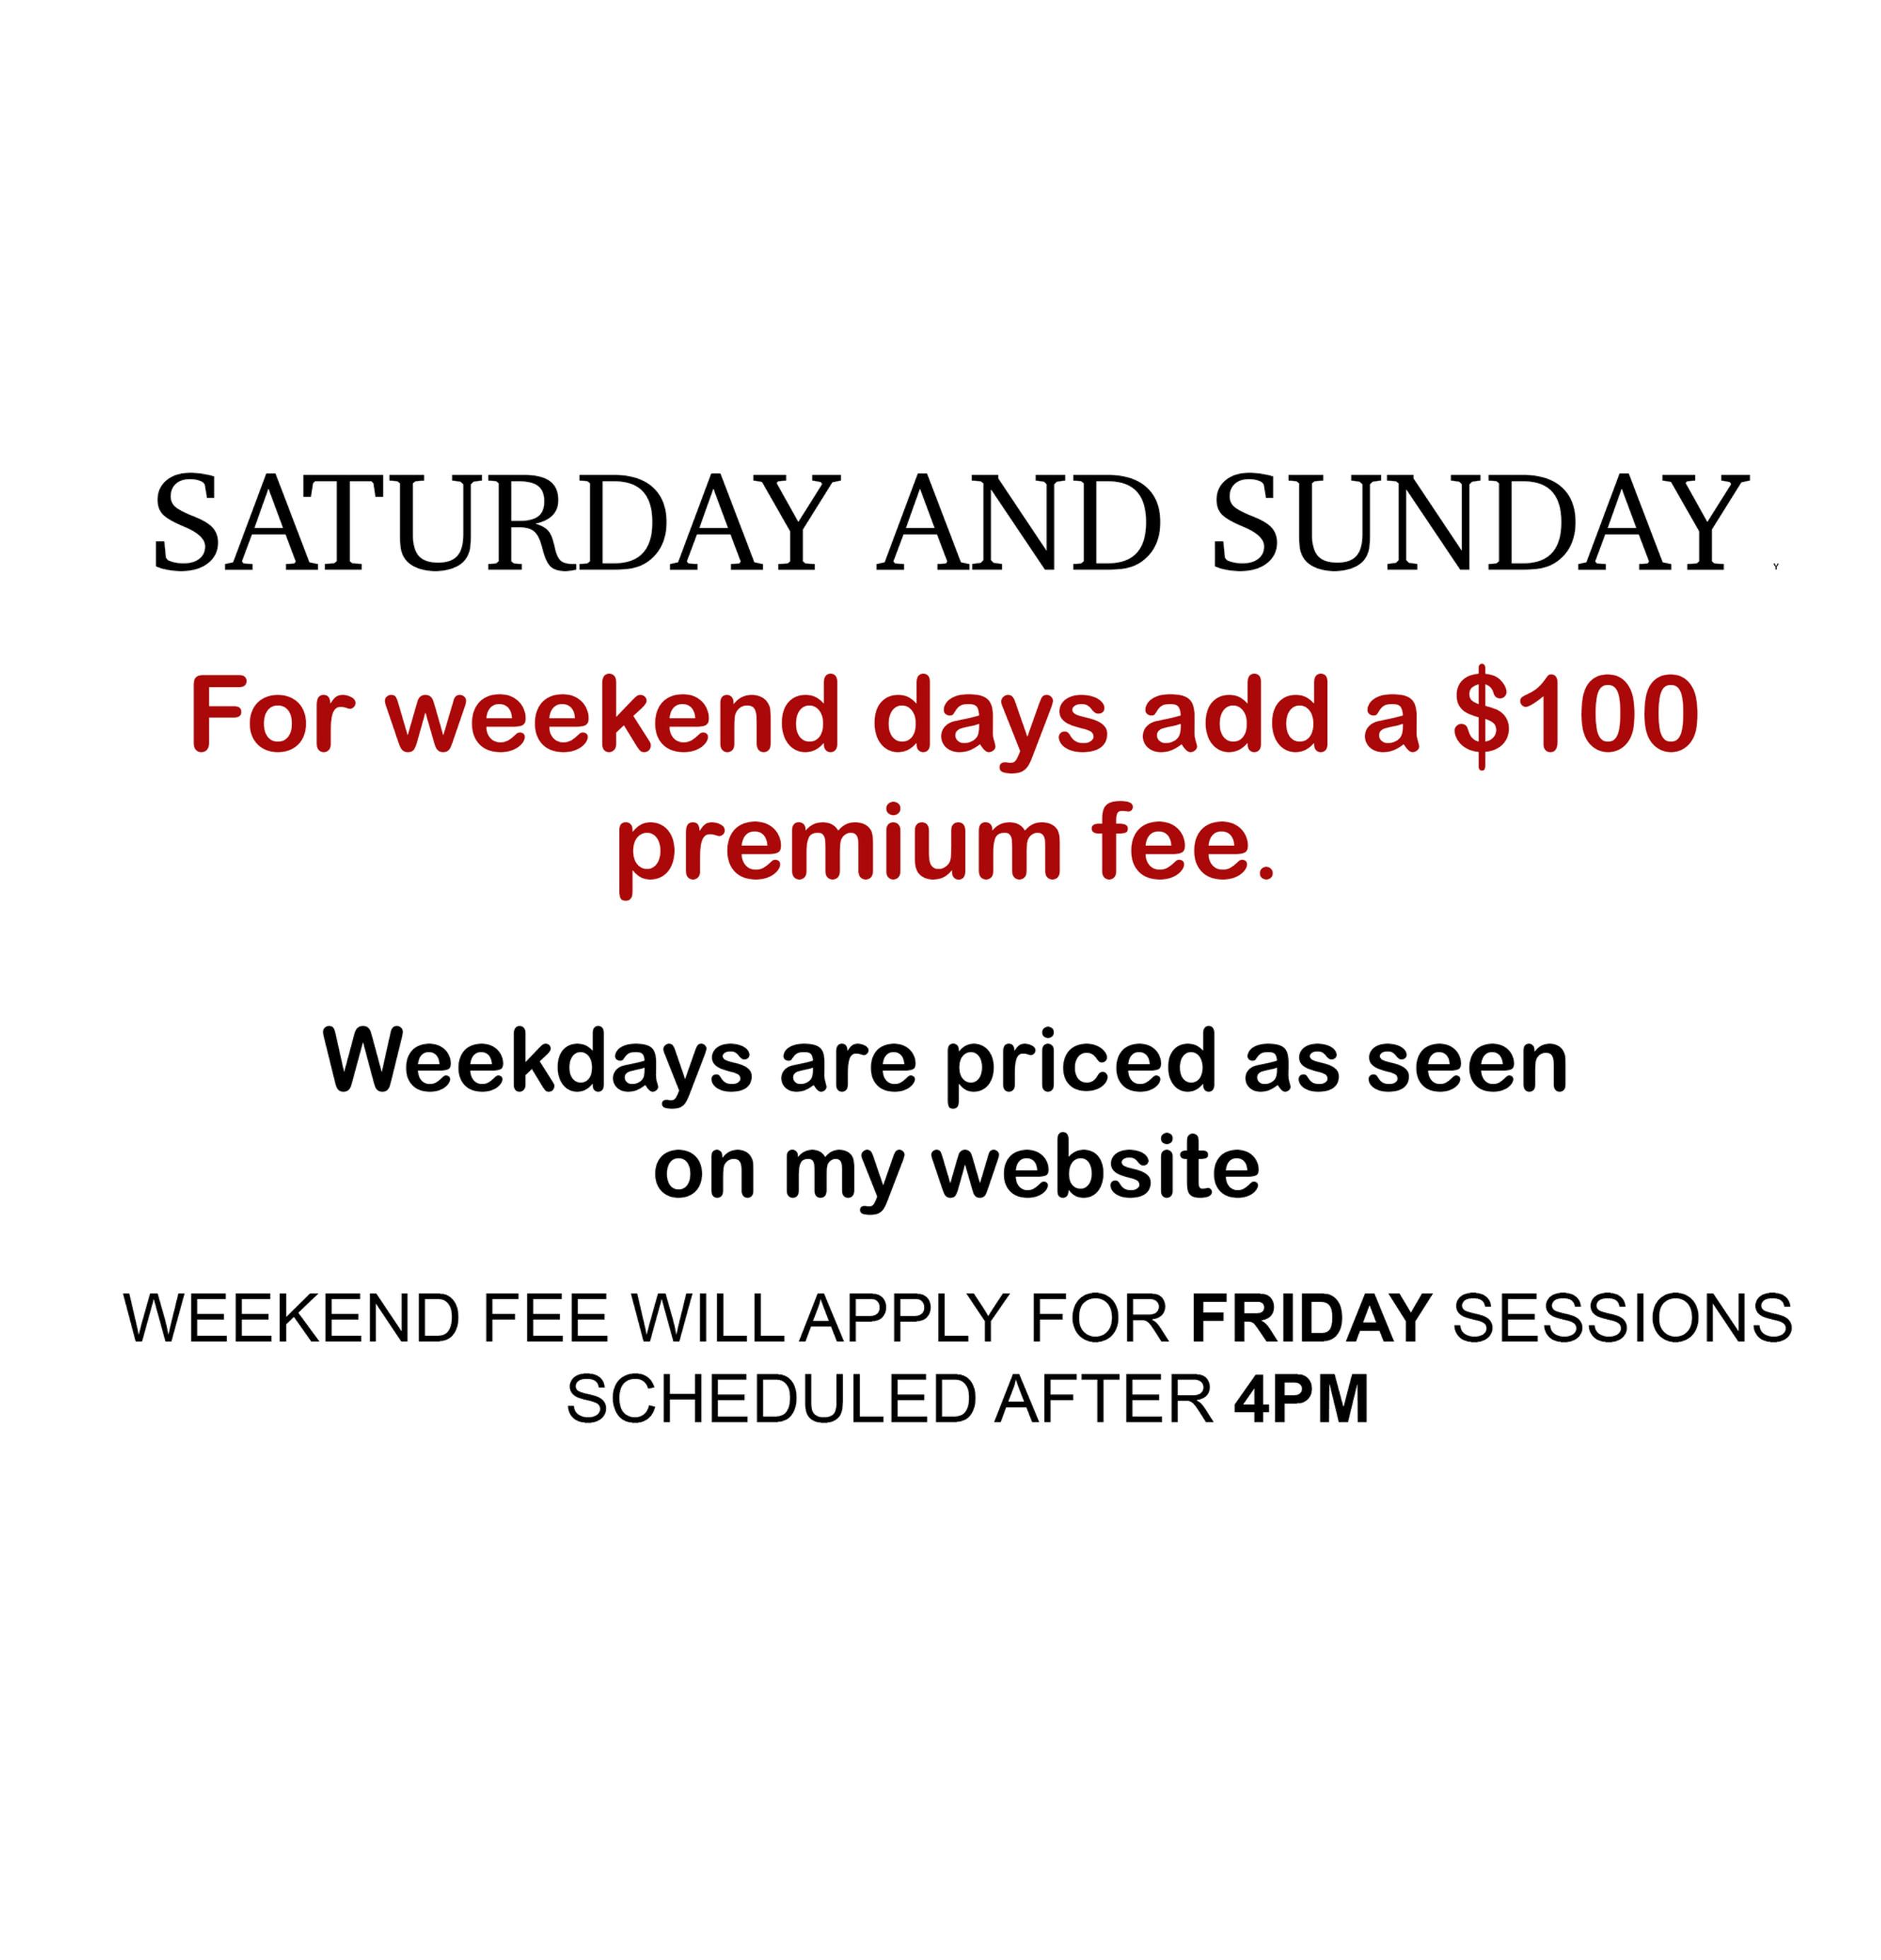 For weekend days add a $100 premium fee.